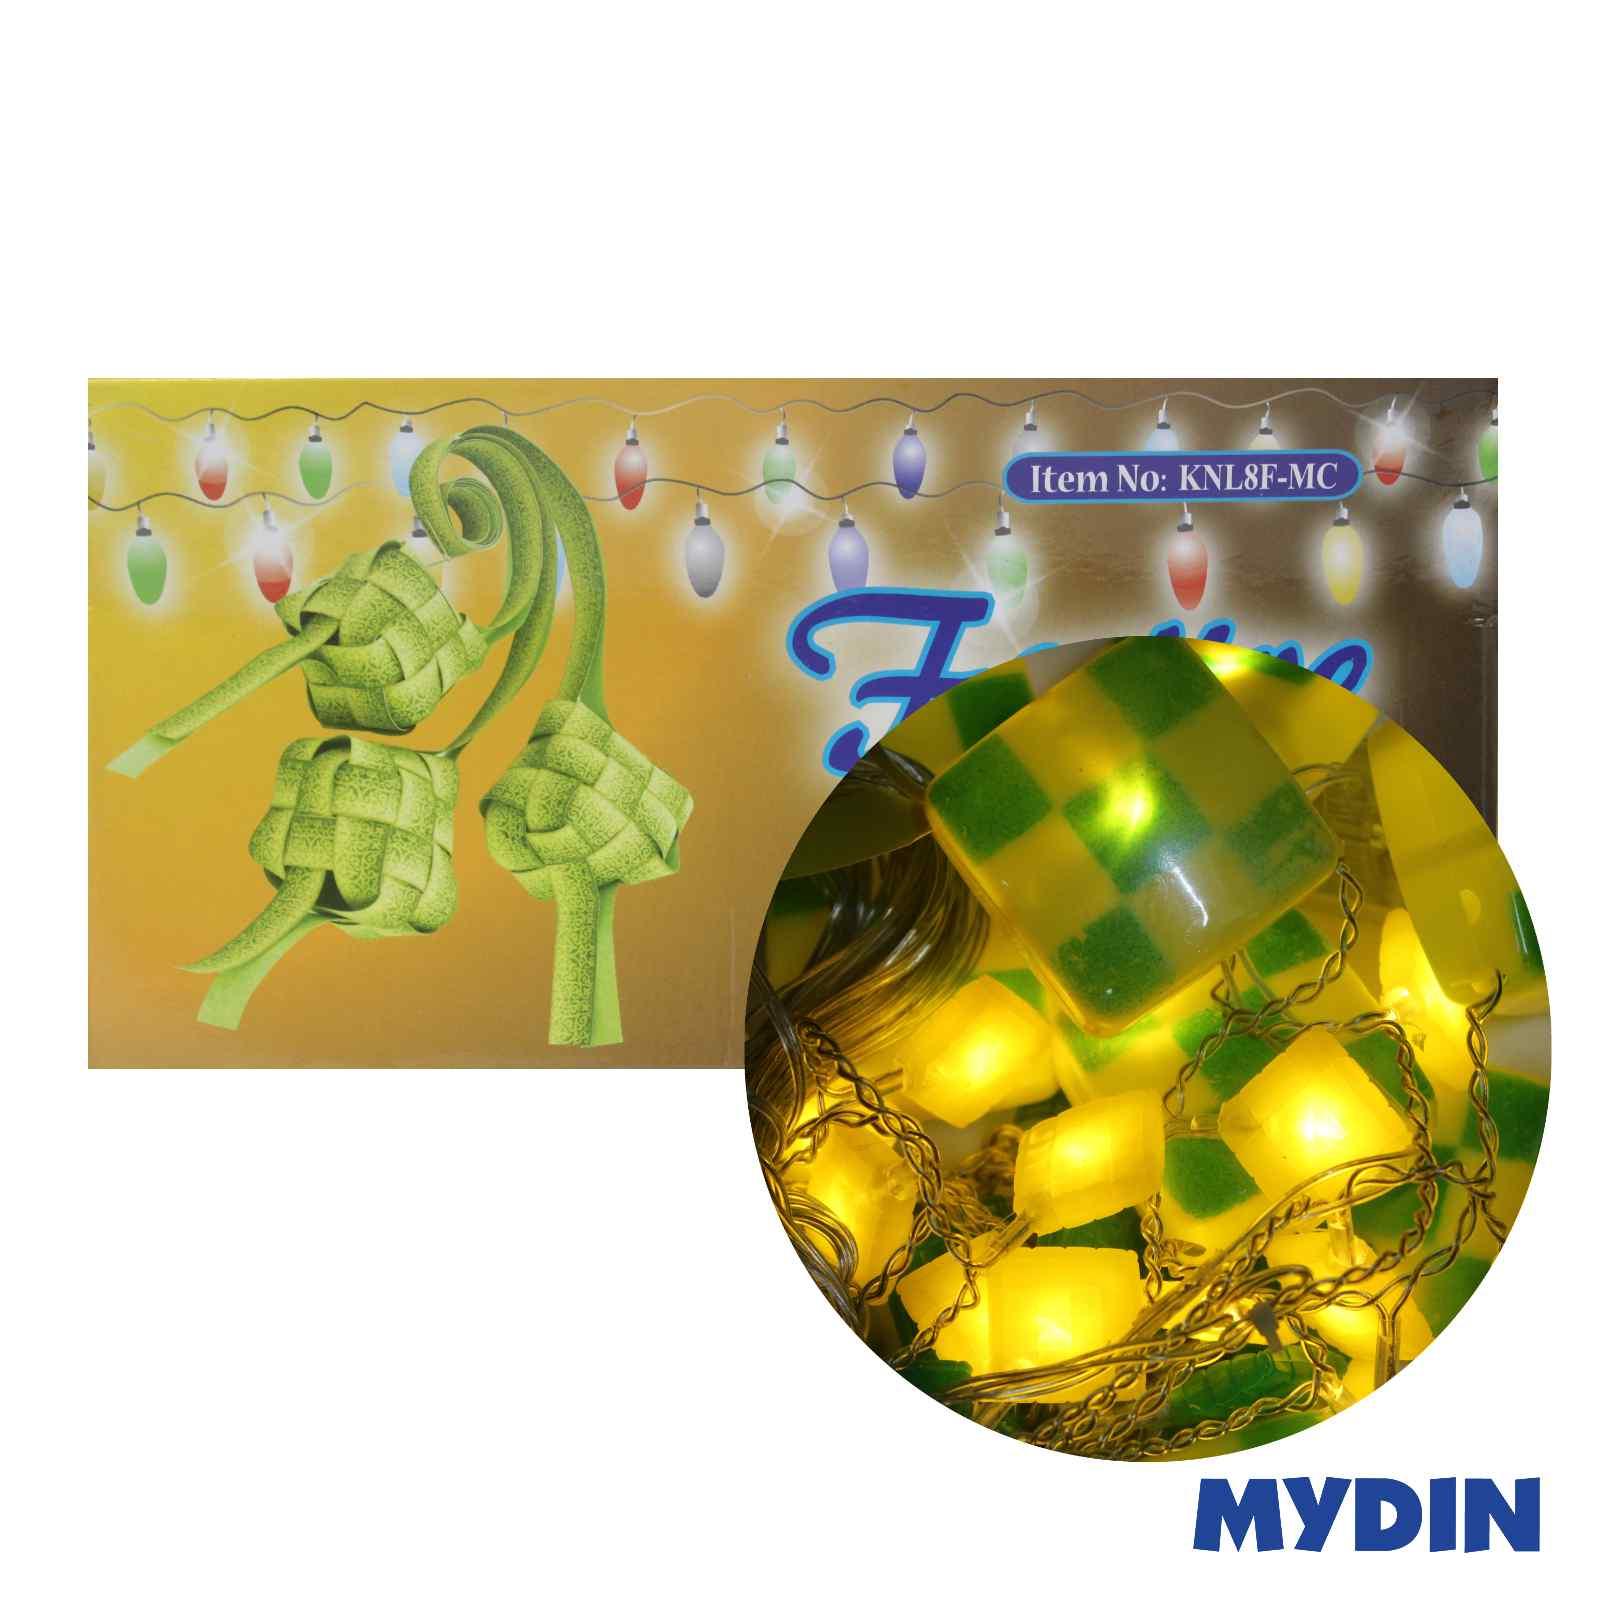 Festive Chasing Light Ketupat Net (Mix Colour)